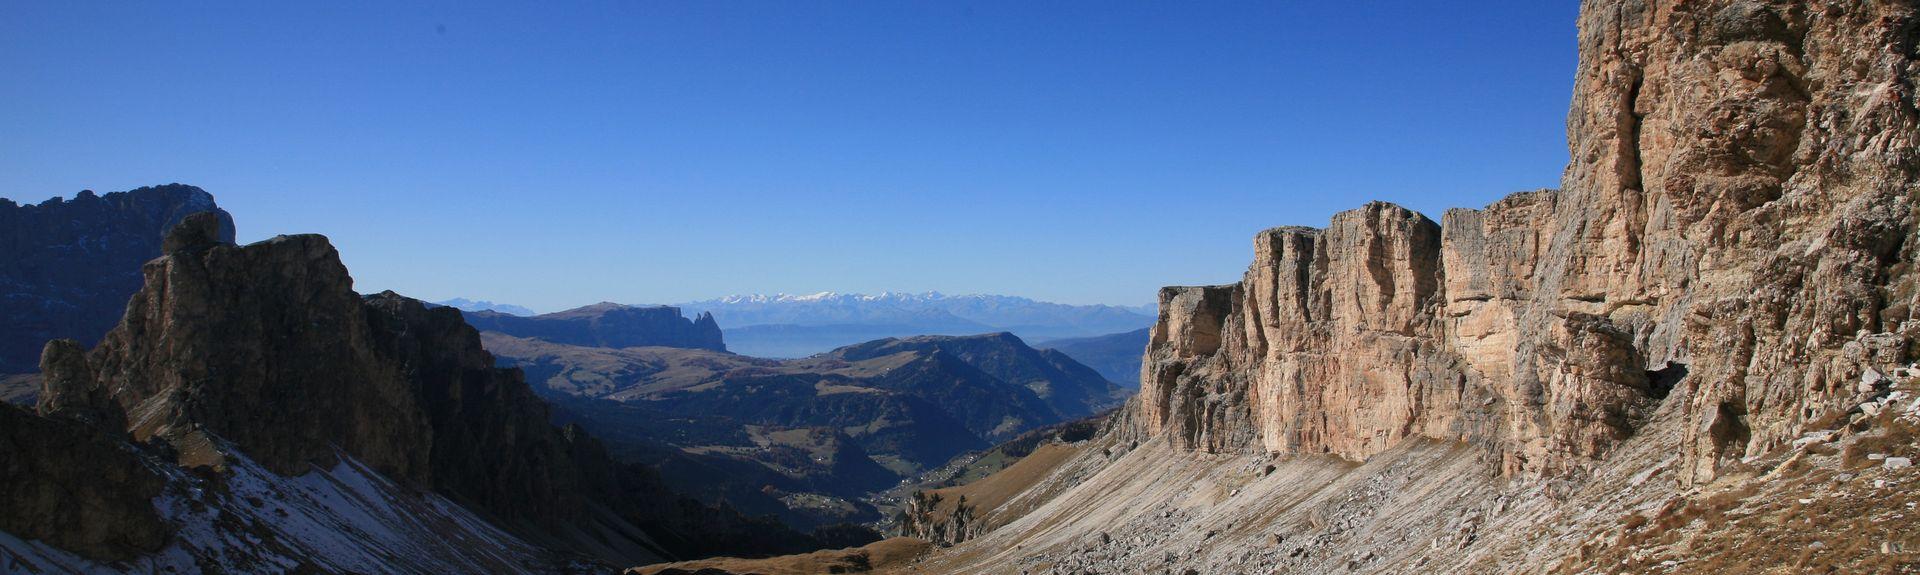 Fondo, Trentino-Alto Adige, Itália